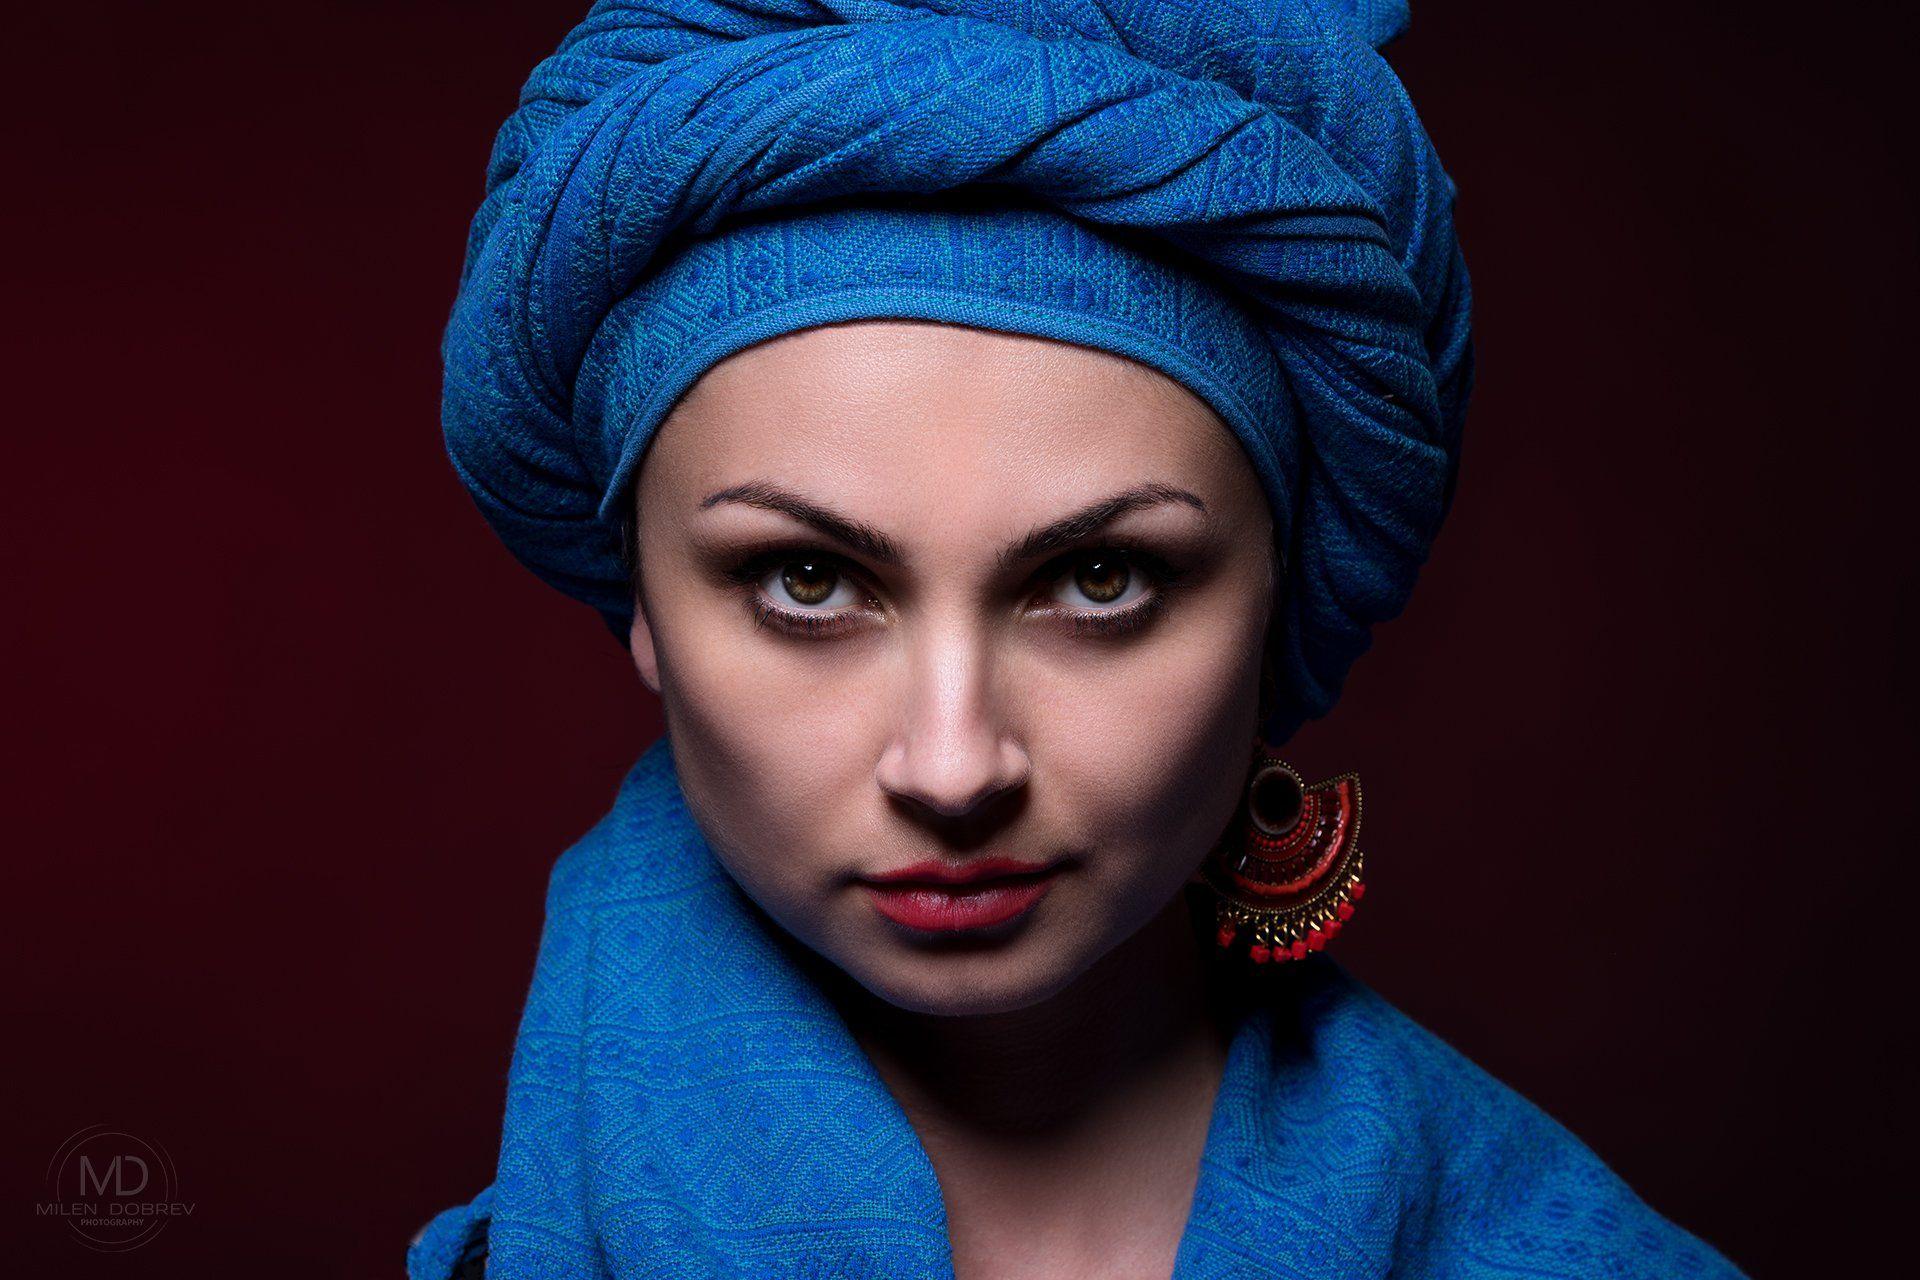 portrait, model, face, beauty, Милен Добрев